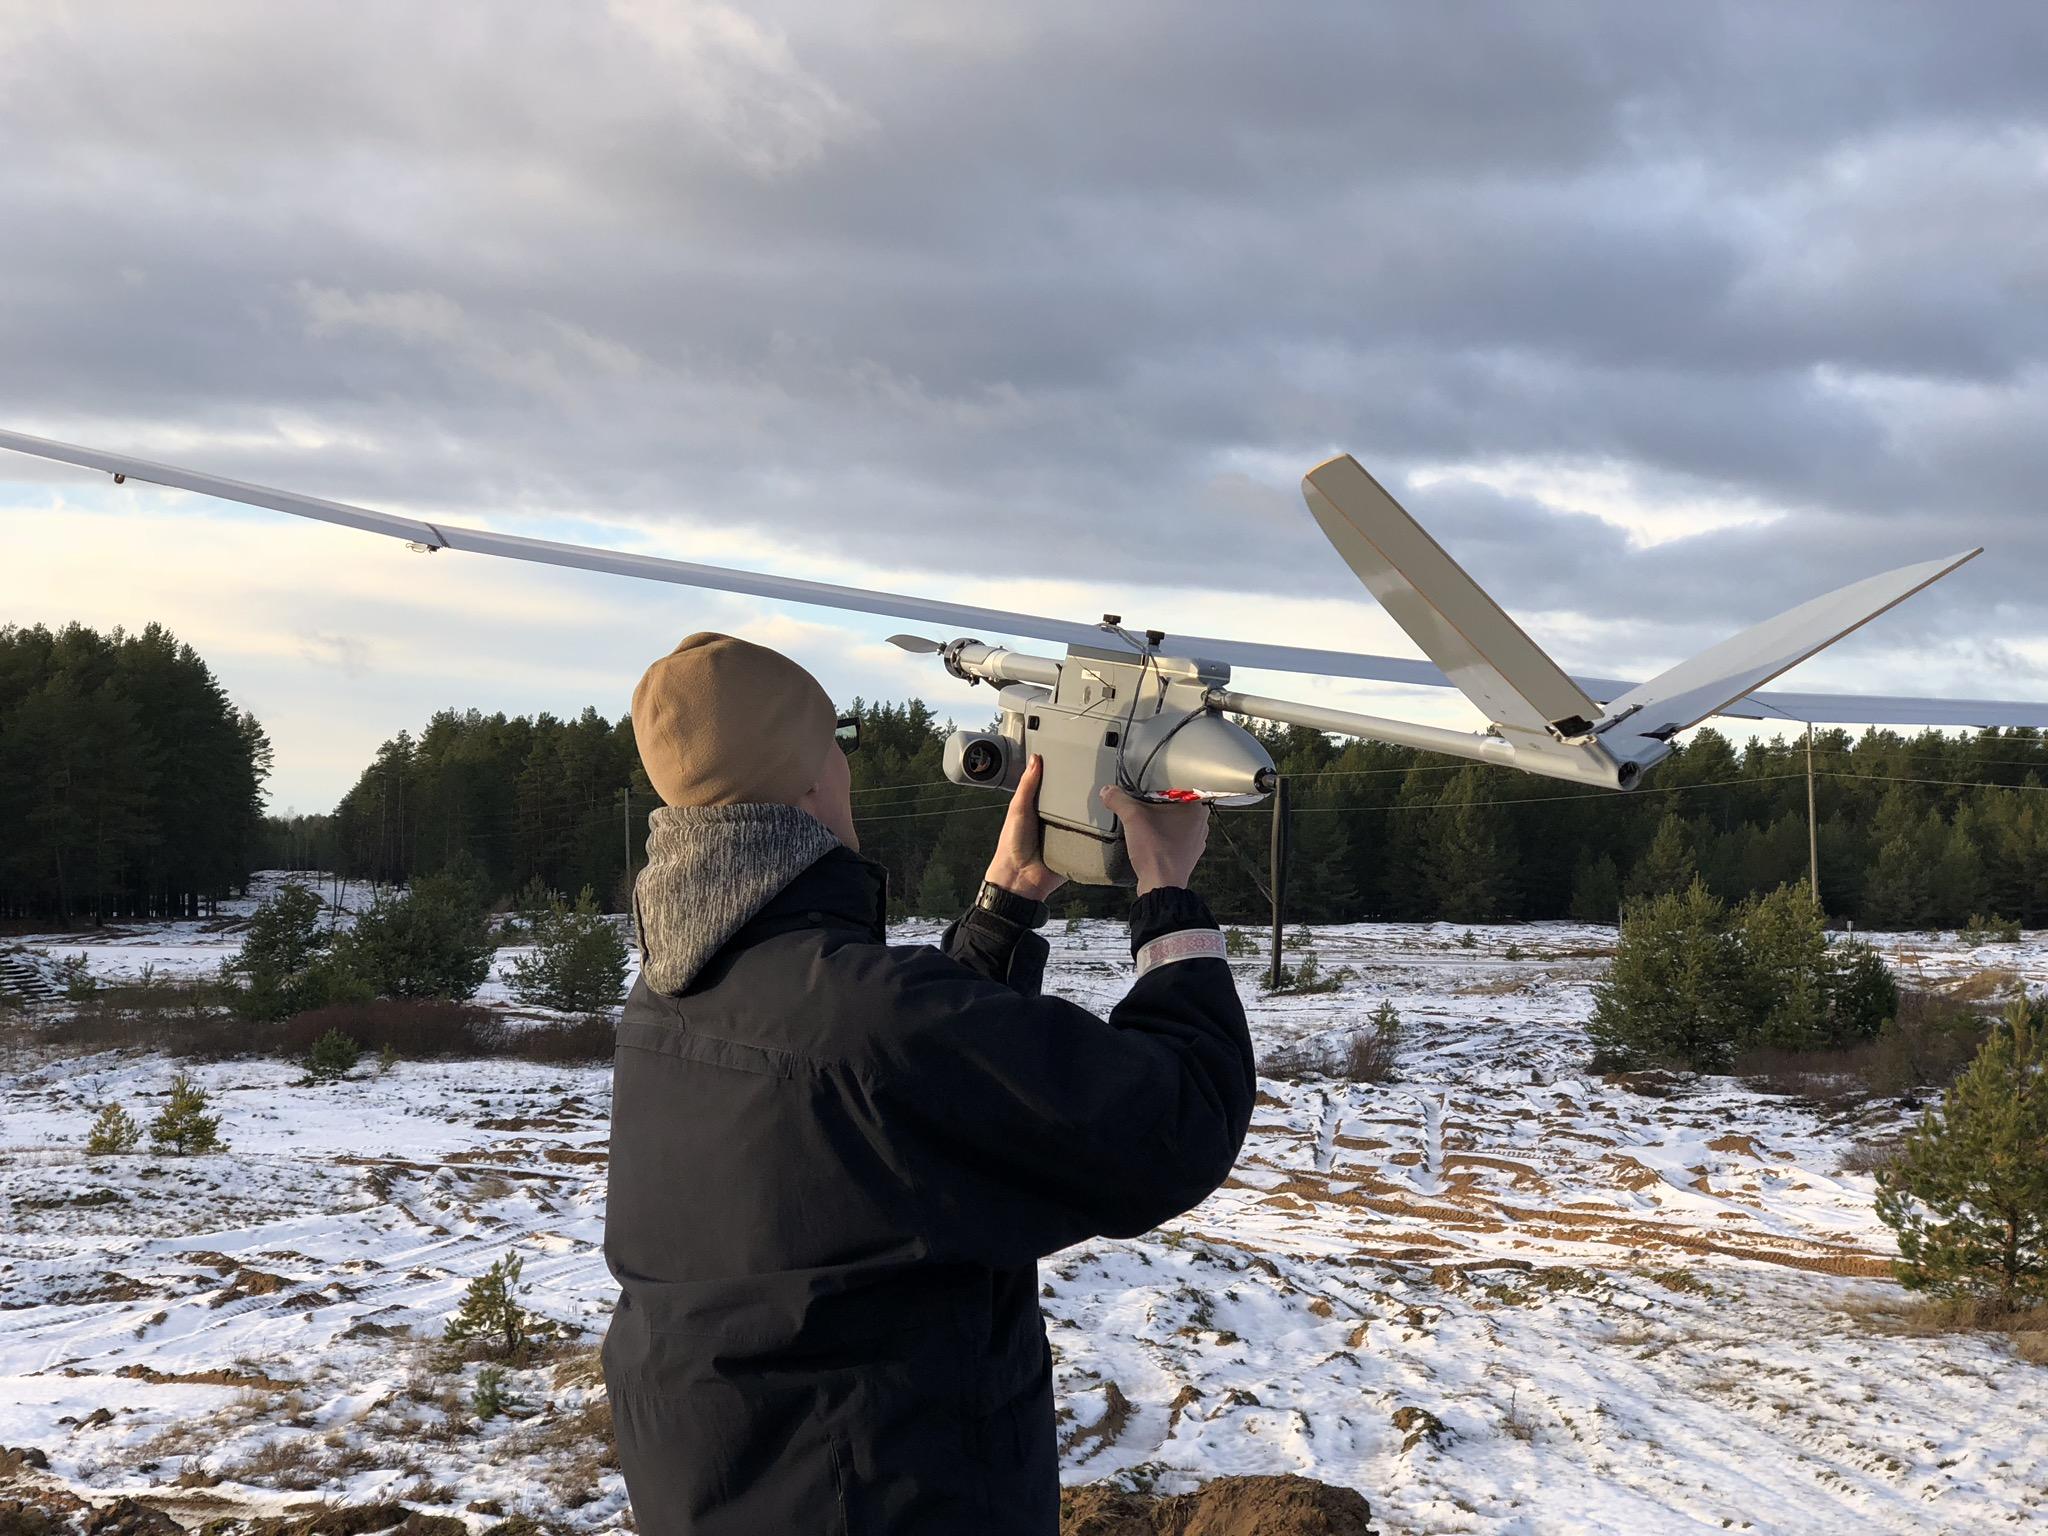 NATO's Crossed Swords exercise preps cyber warriors